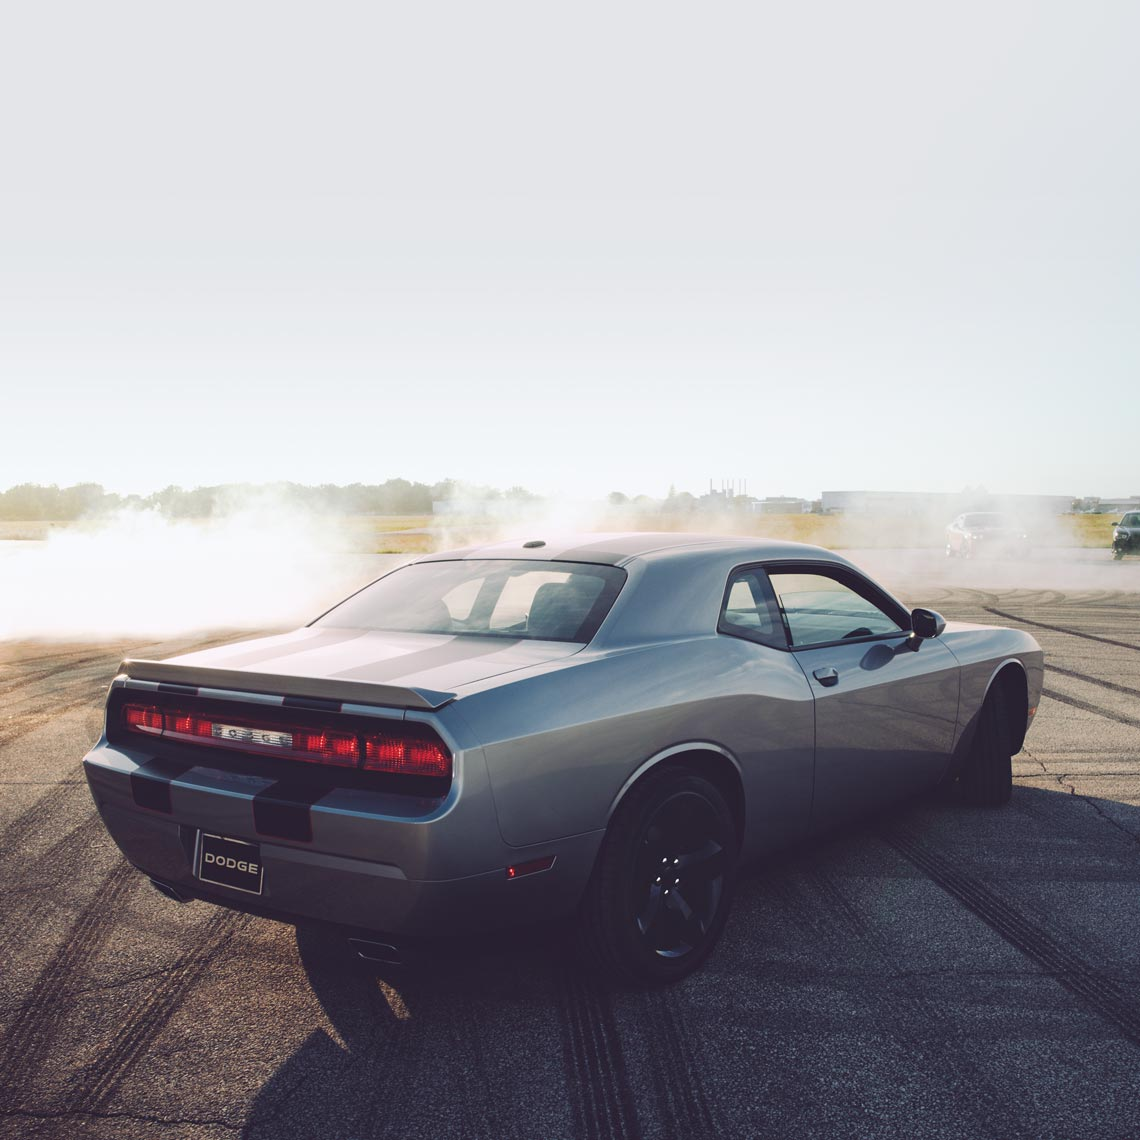 Dodge | Dodge.com Redesign